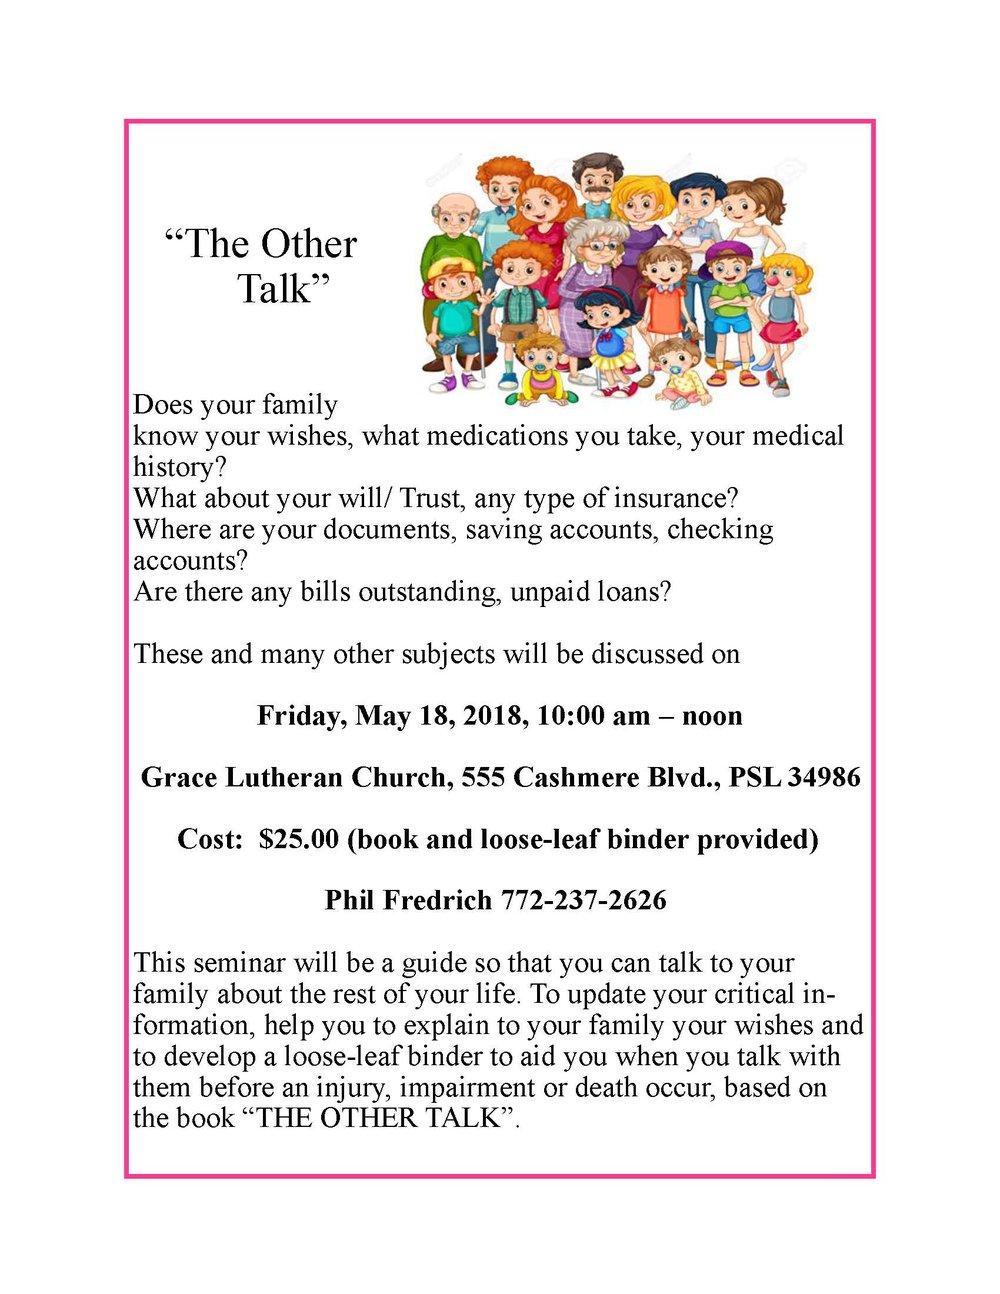 Grace News Ltr May 2018 pub (1)_Page_06.jpg